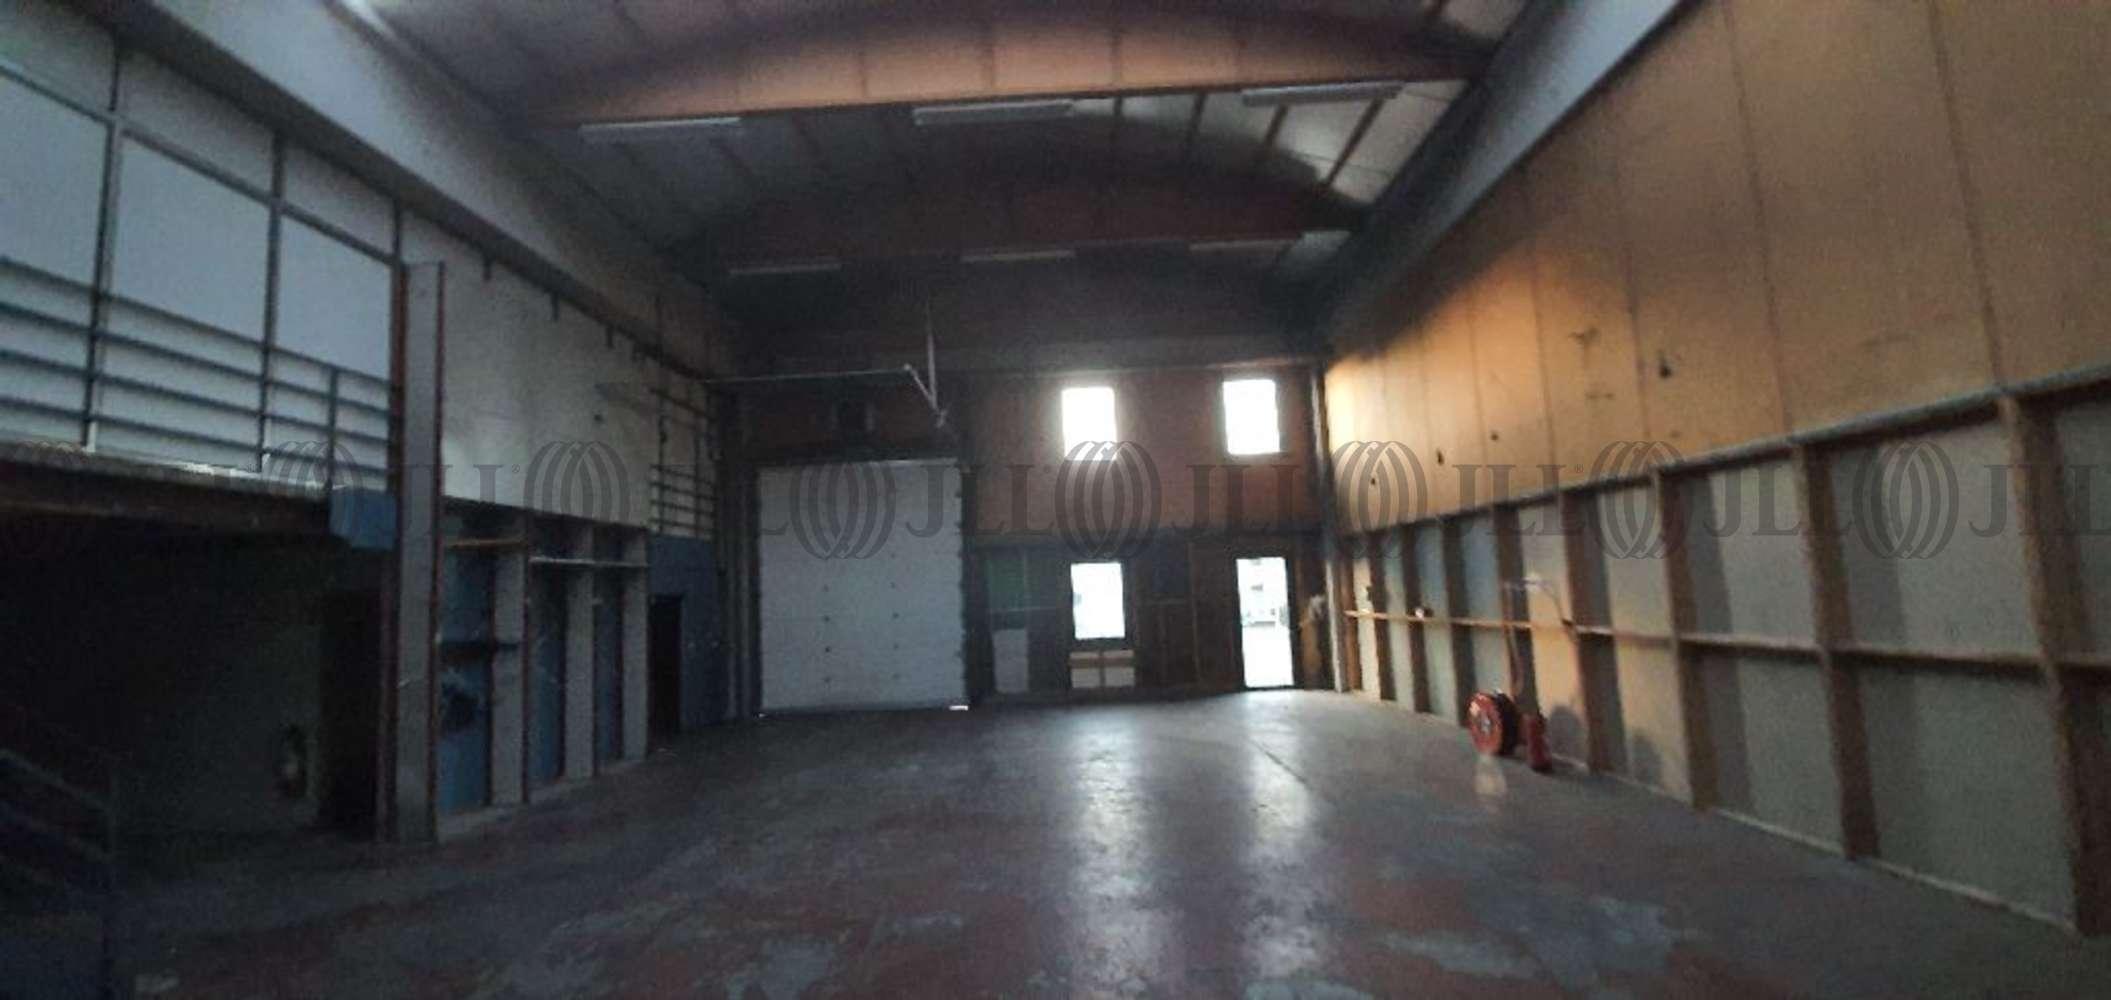 Activités/entrepôt Dardilly, 69570 - Location locaux d'activité Dardilly Lyon - 10921717